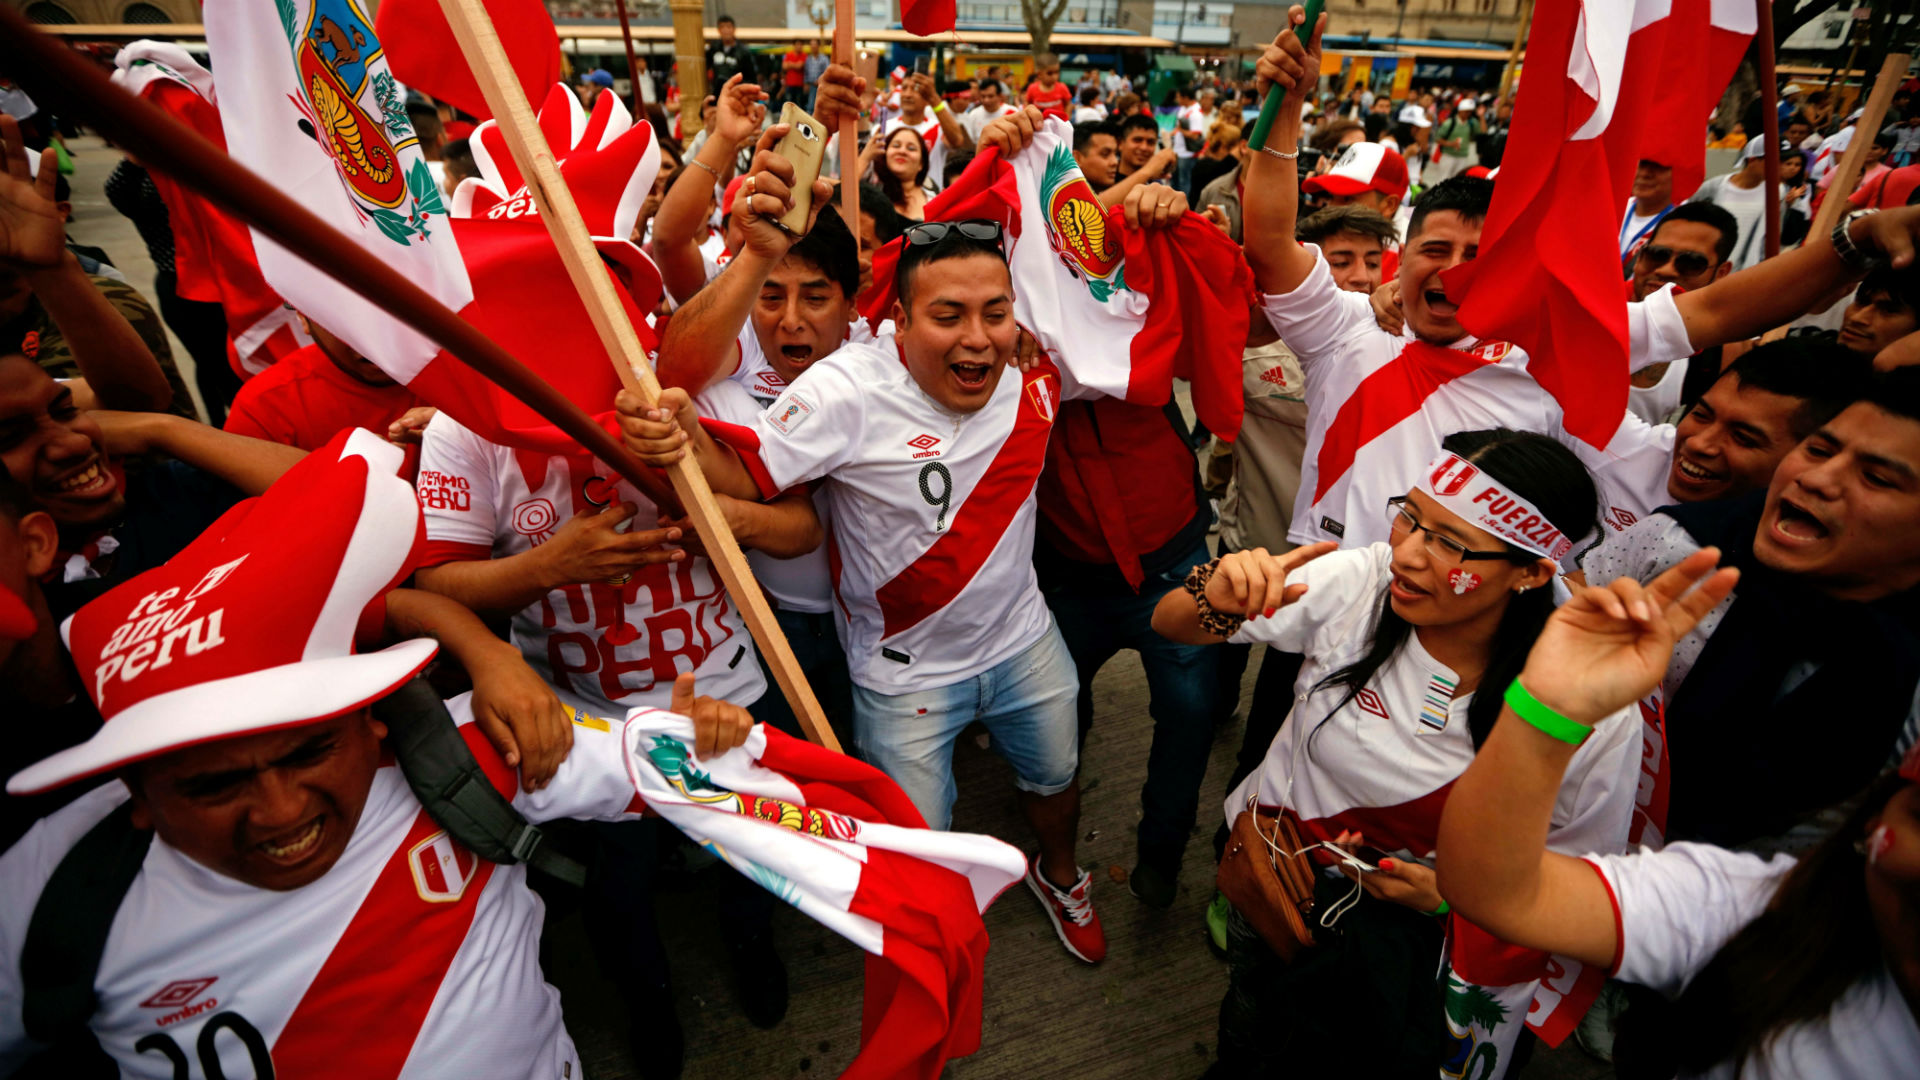 Argentina Peru WC Qualification Fans